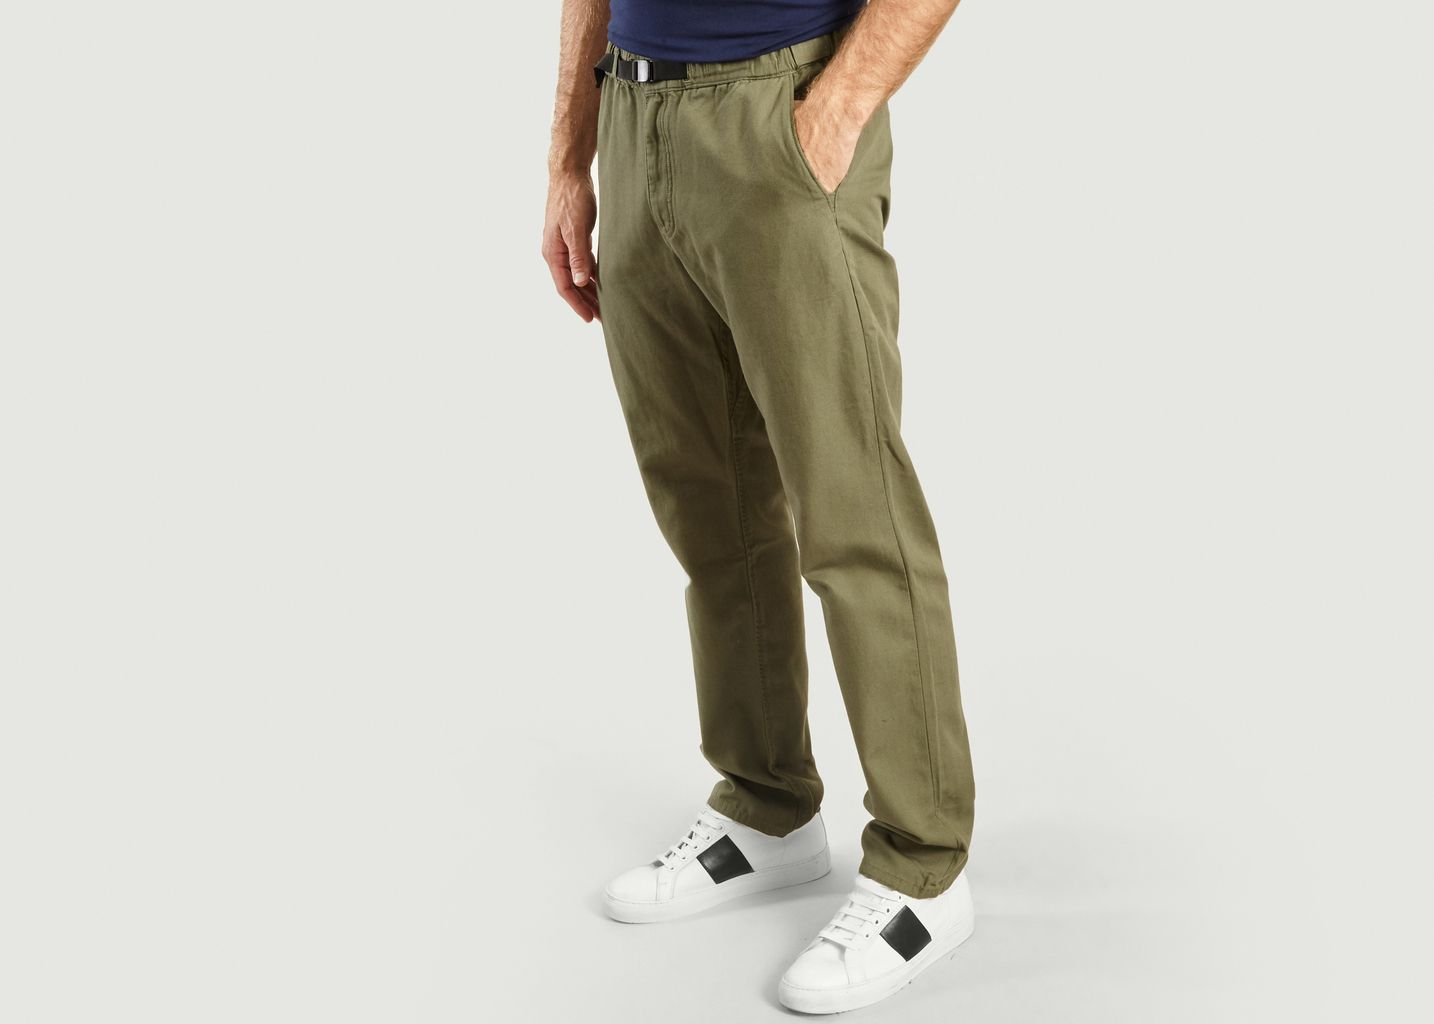 Pantalon Organic Gi Pants - Patagonia